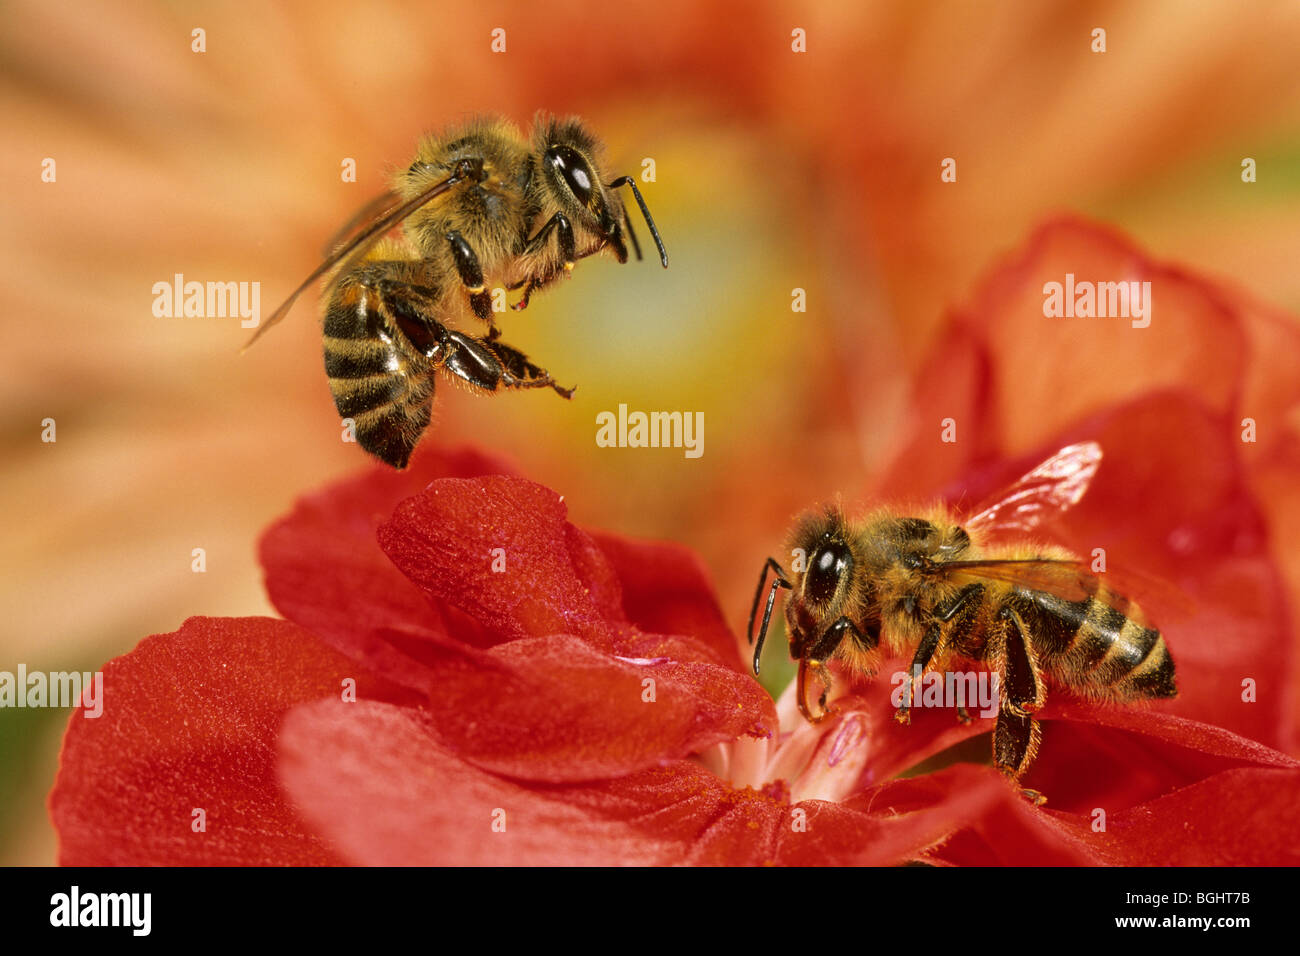 Carniolan de abejas (Apis mellifera Carnica), dos trabajadores de una Begonia. Foto de stock